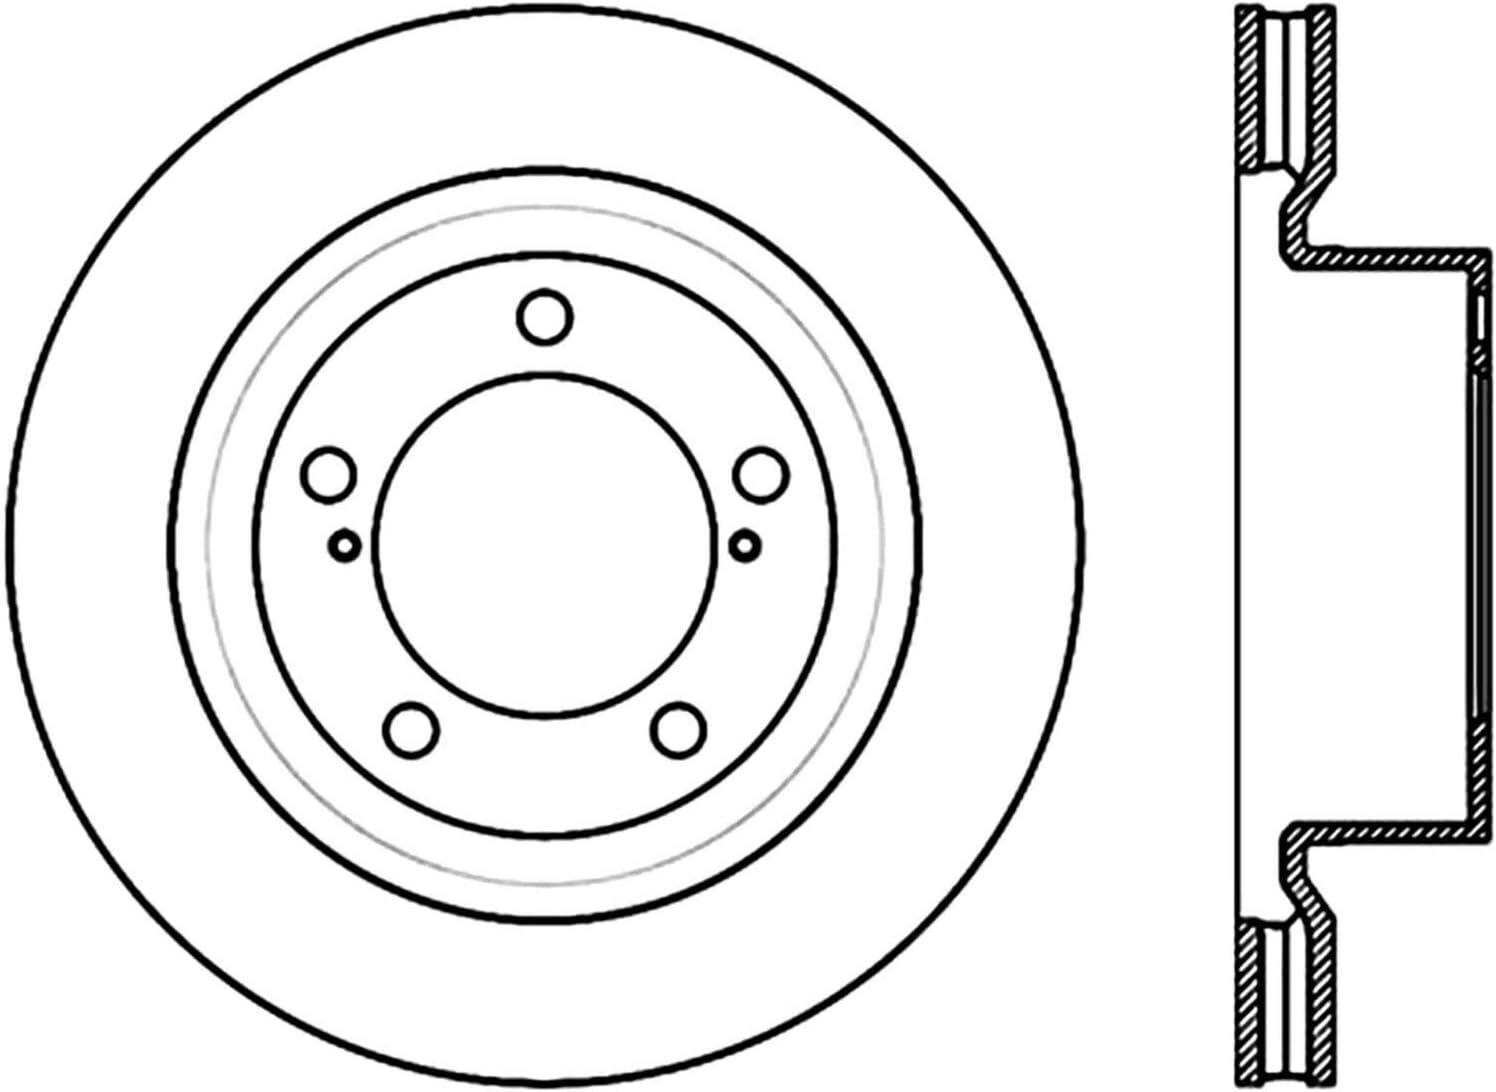 DuraGo BR900336 Front Vented Disc Brake Rotor Rotors Automotive ...